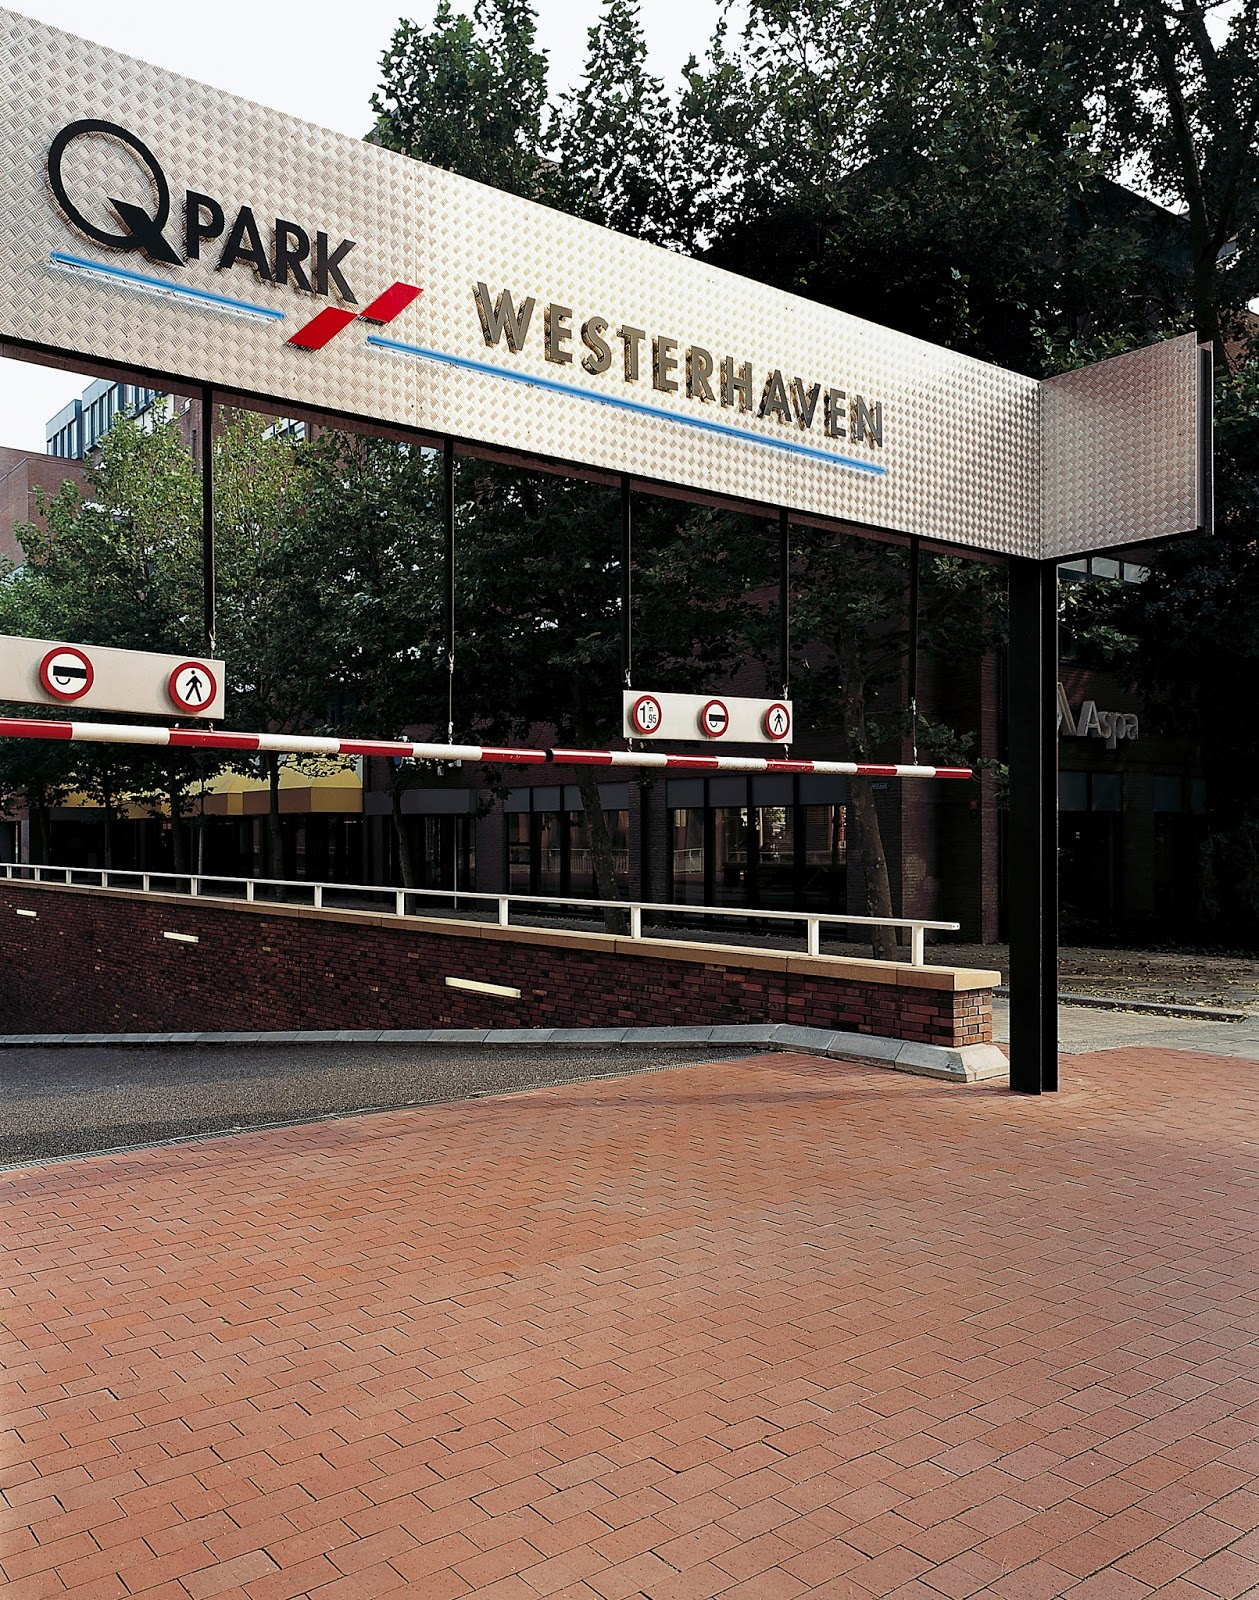 Q Park Westerhaven Groningen accepteert American Express Credit Cards